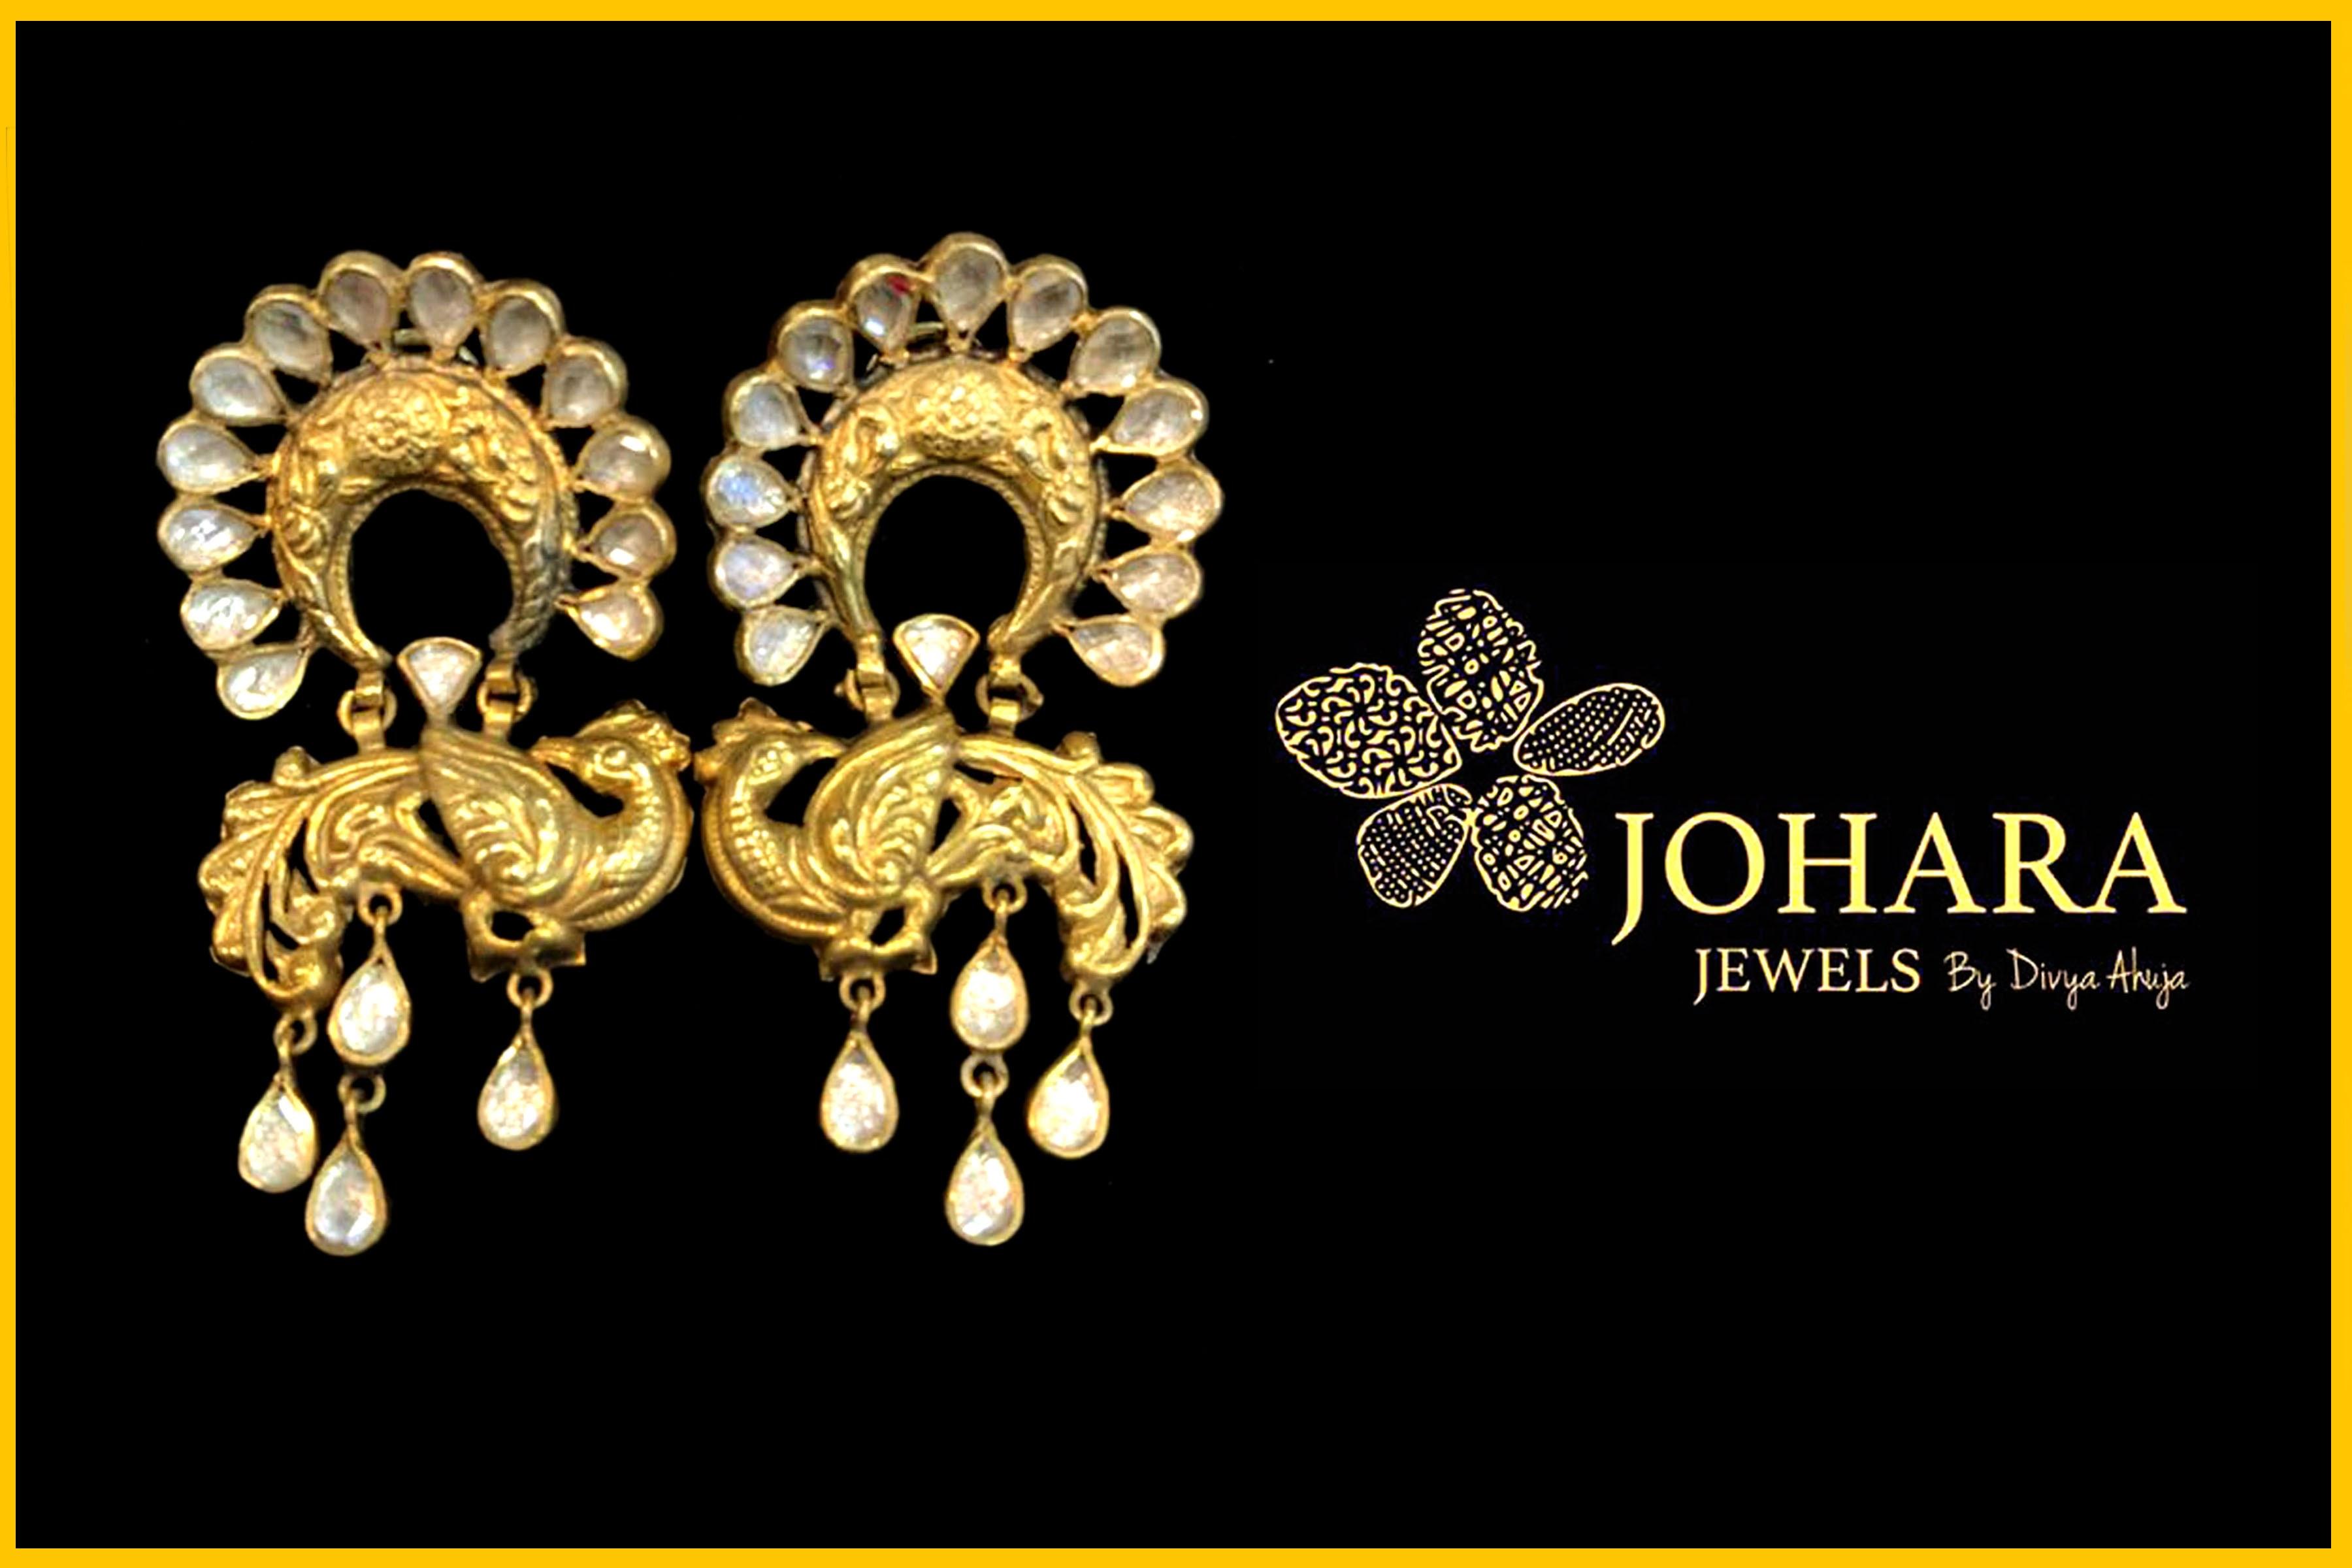 Portfolio - Johara jewels pvt ltd